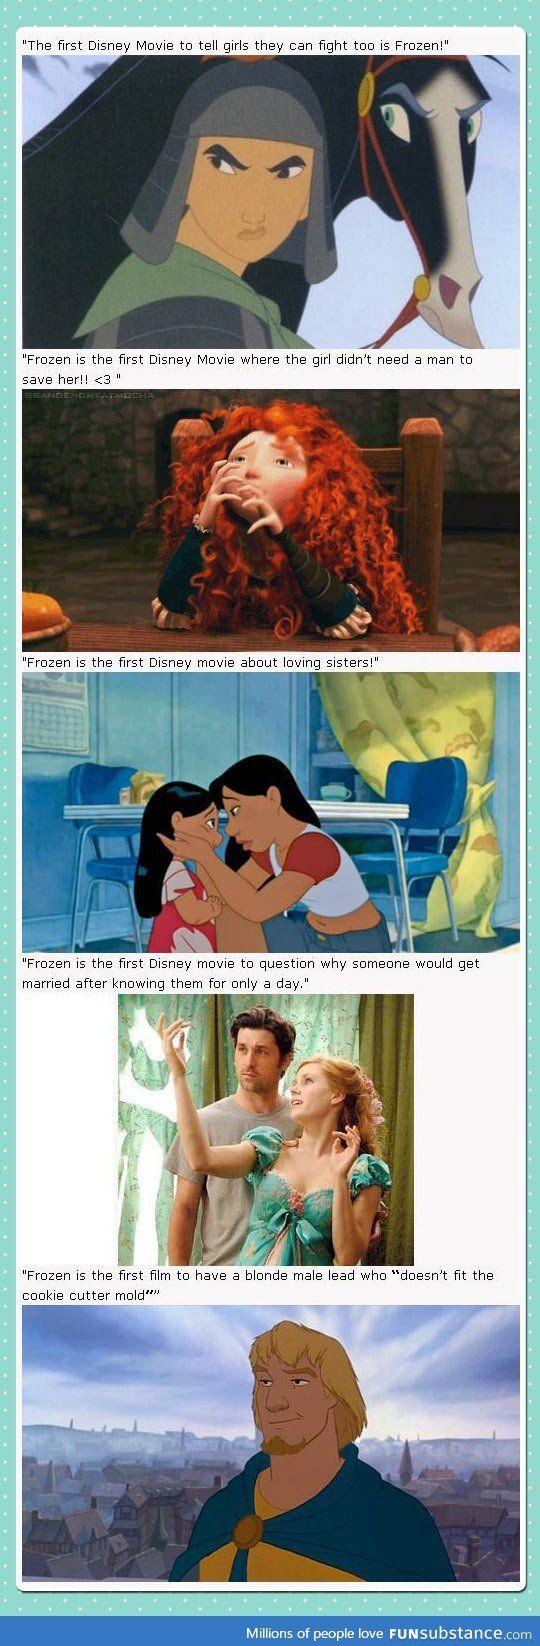 Frozen is good! But...